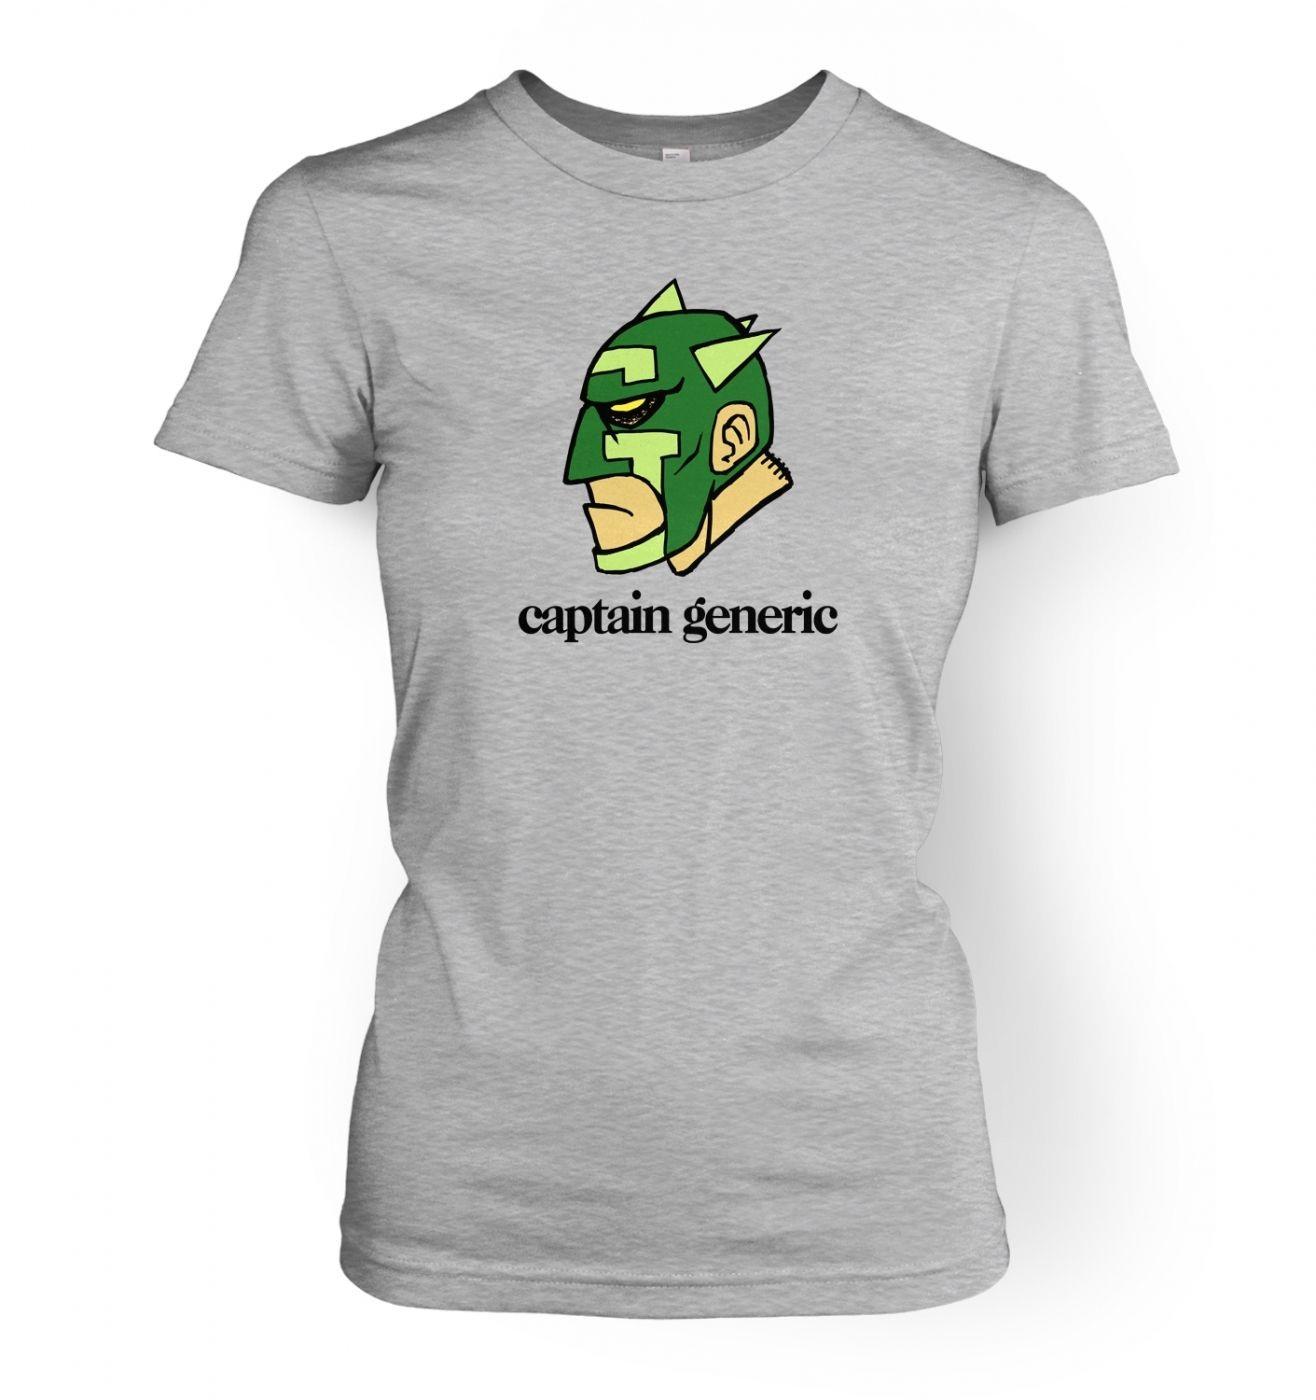 Captain generic womens t shirt somethinggeeky captain generic womens fitted t shirt gamestrikefo Choice Image